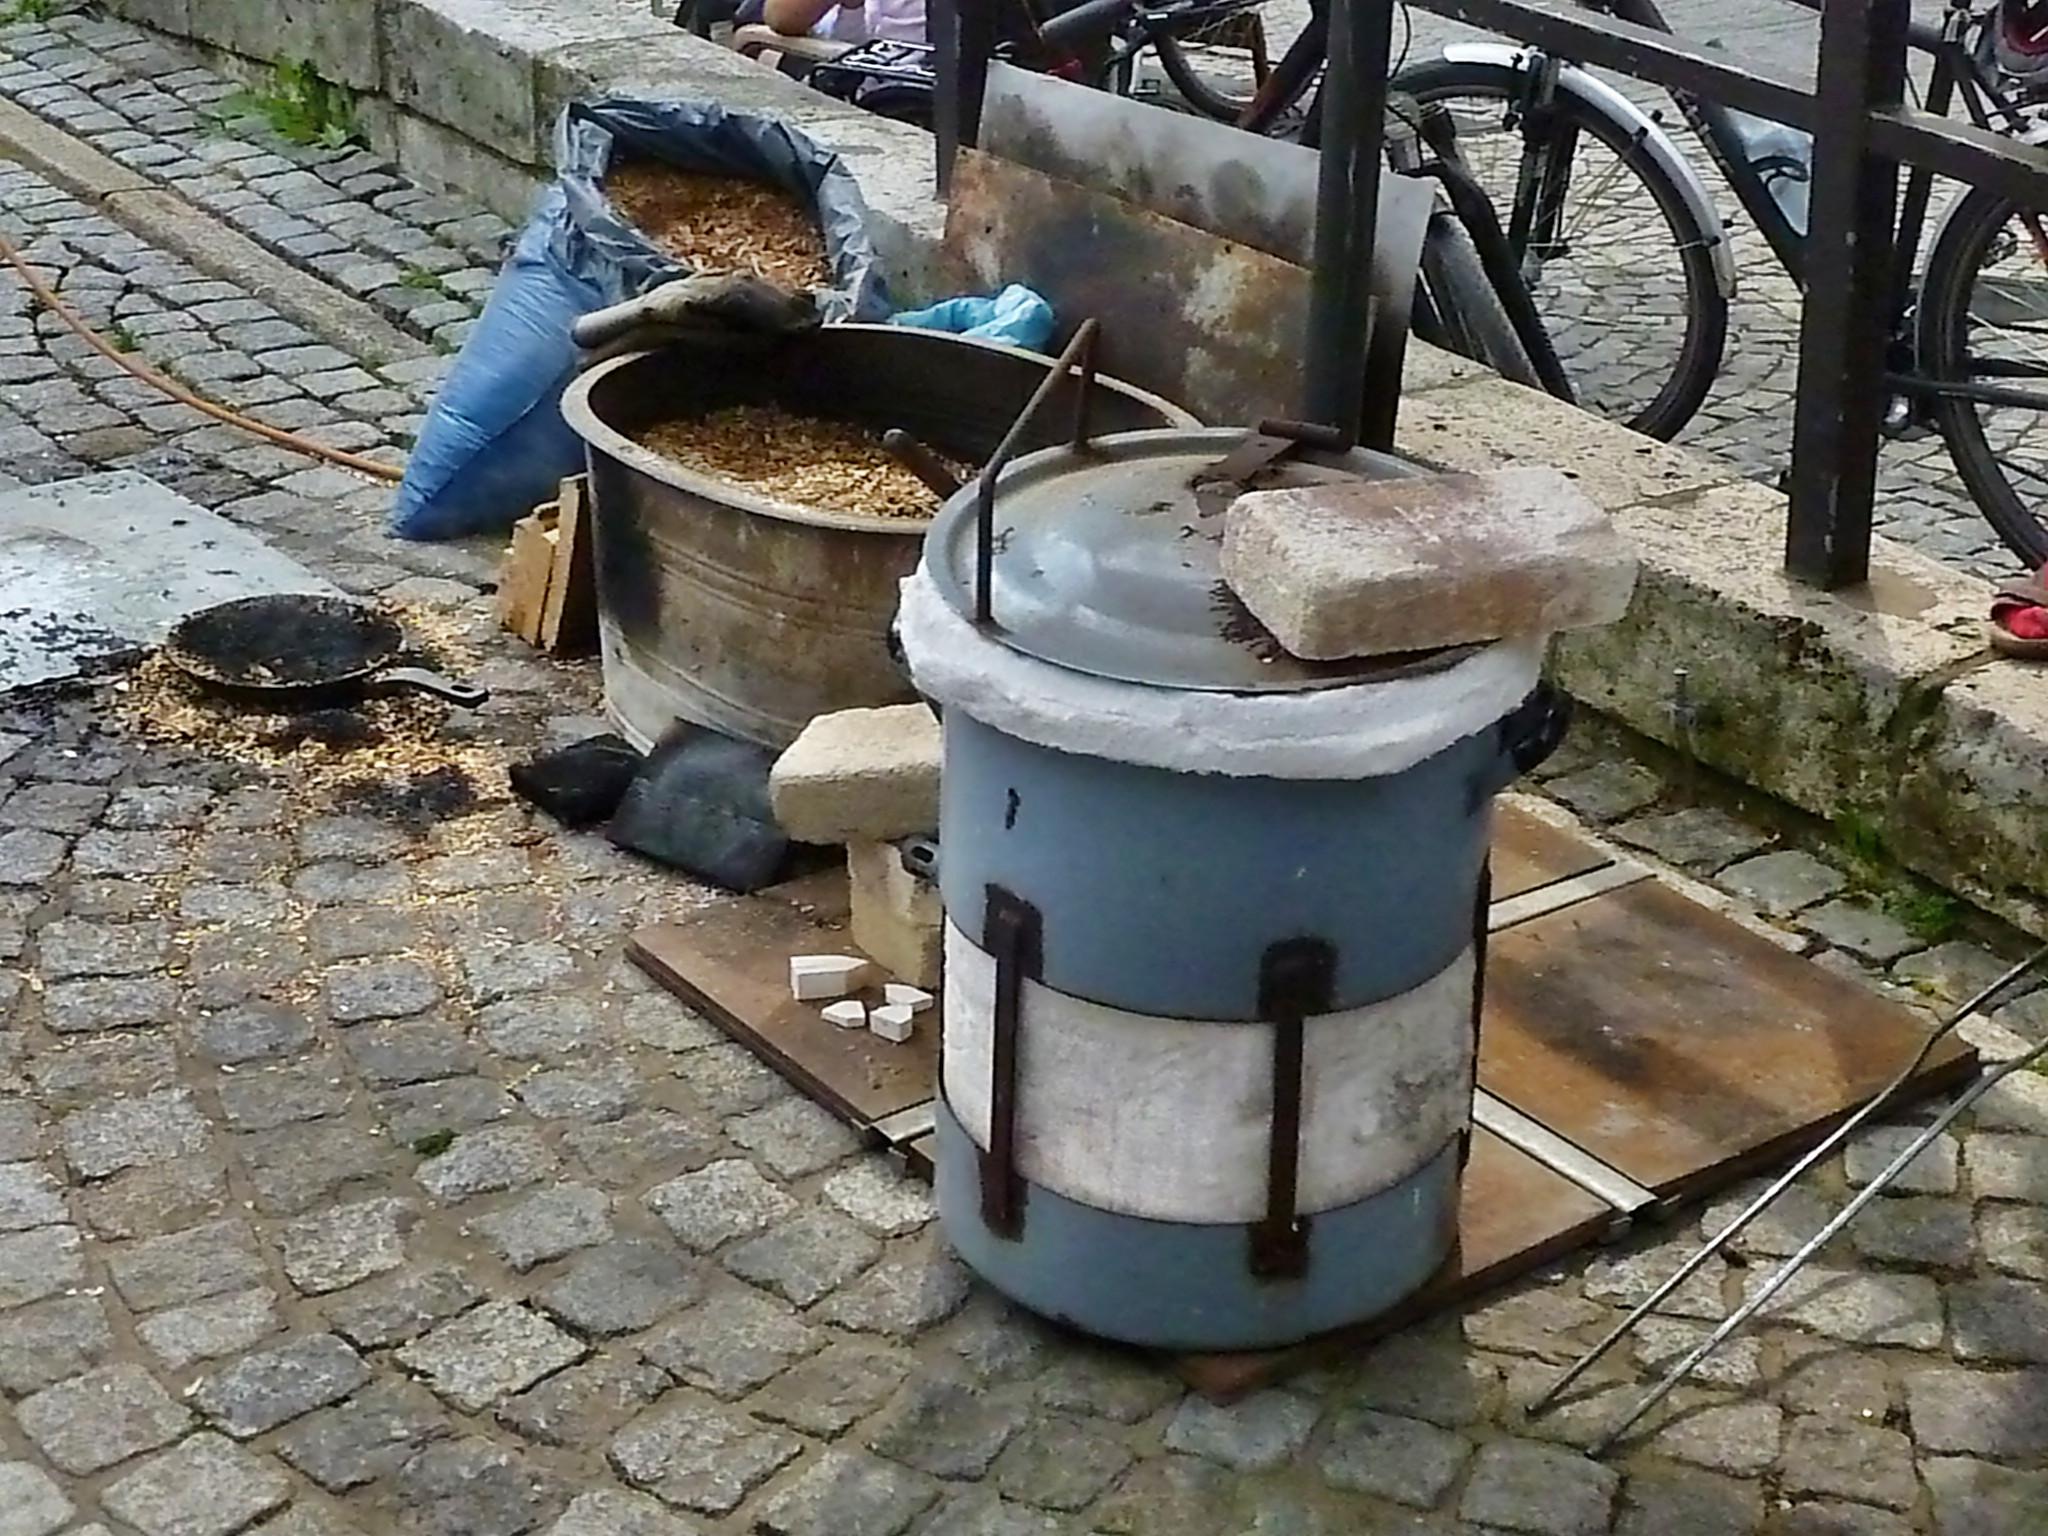 Jenaer Töpfermarkt-27.7.14   (6)